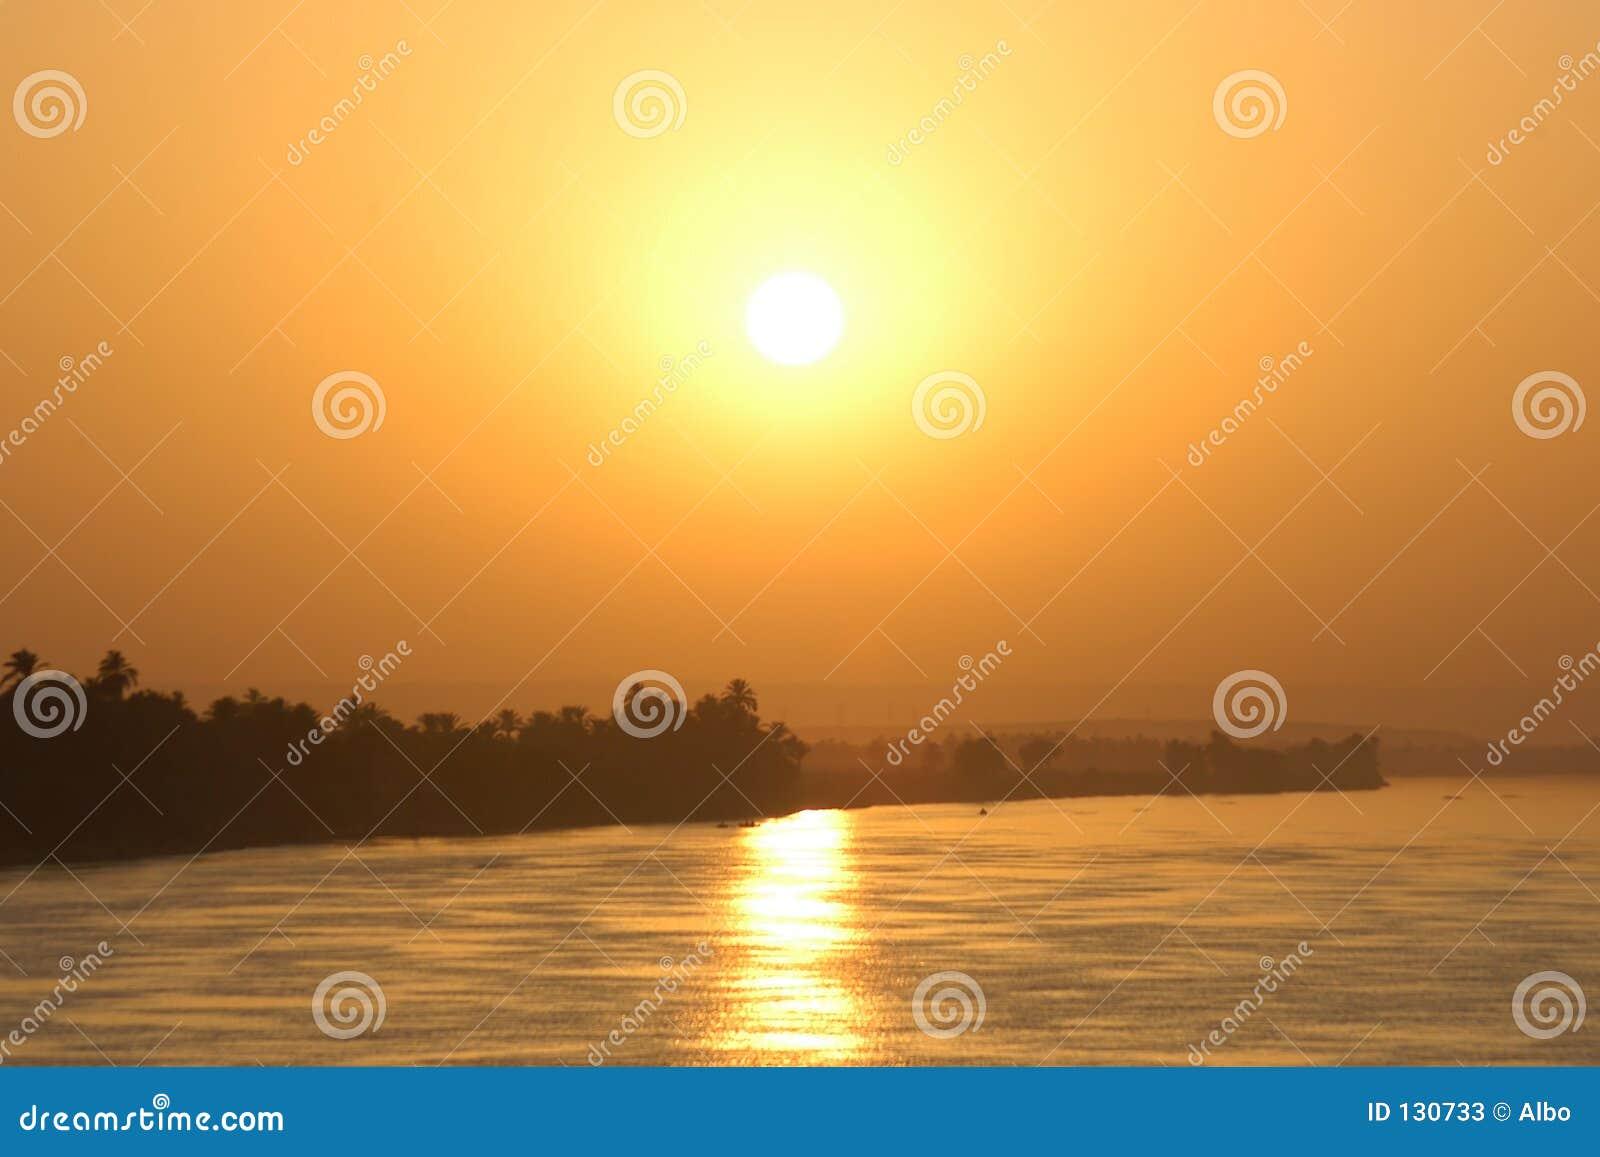 Nile sun